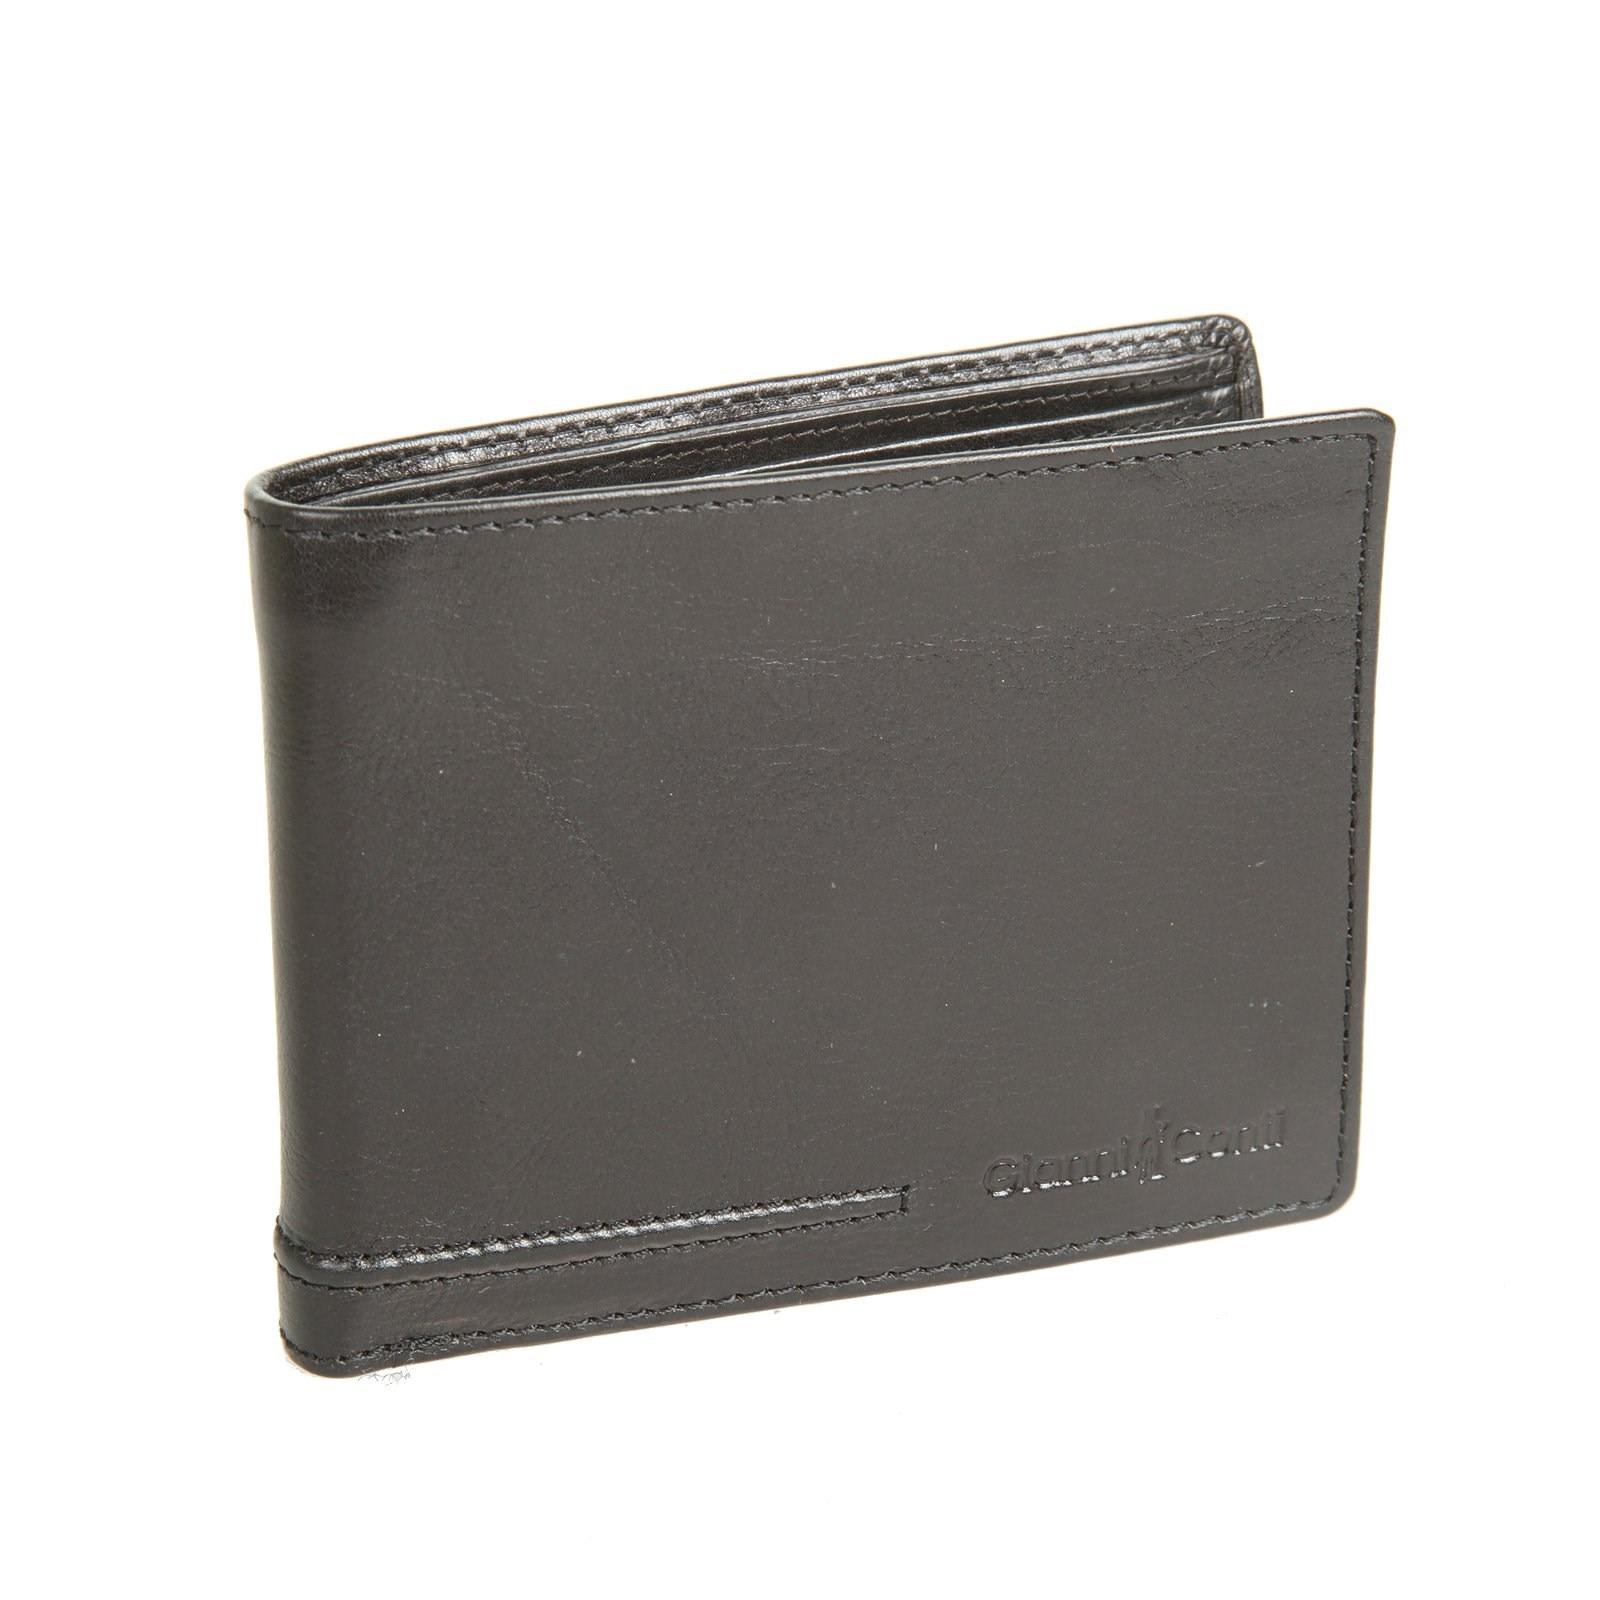 Coin Purse Gianni Conti 707100 black 2017 hottest women short design gradient color coin purse cute ladies wallet bags pu leather handbags card holder clutch purse